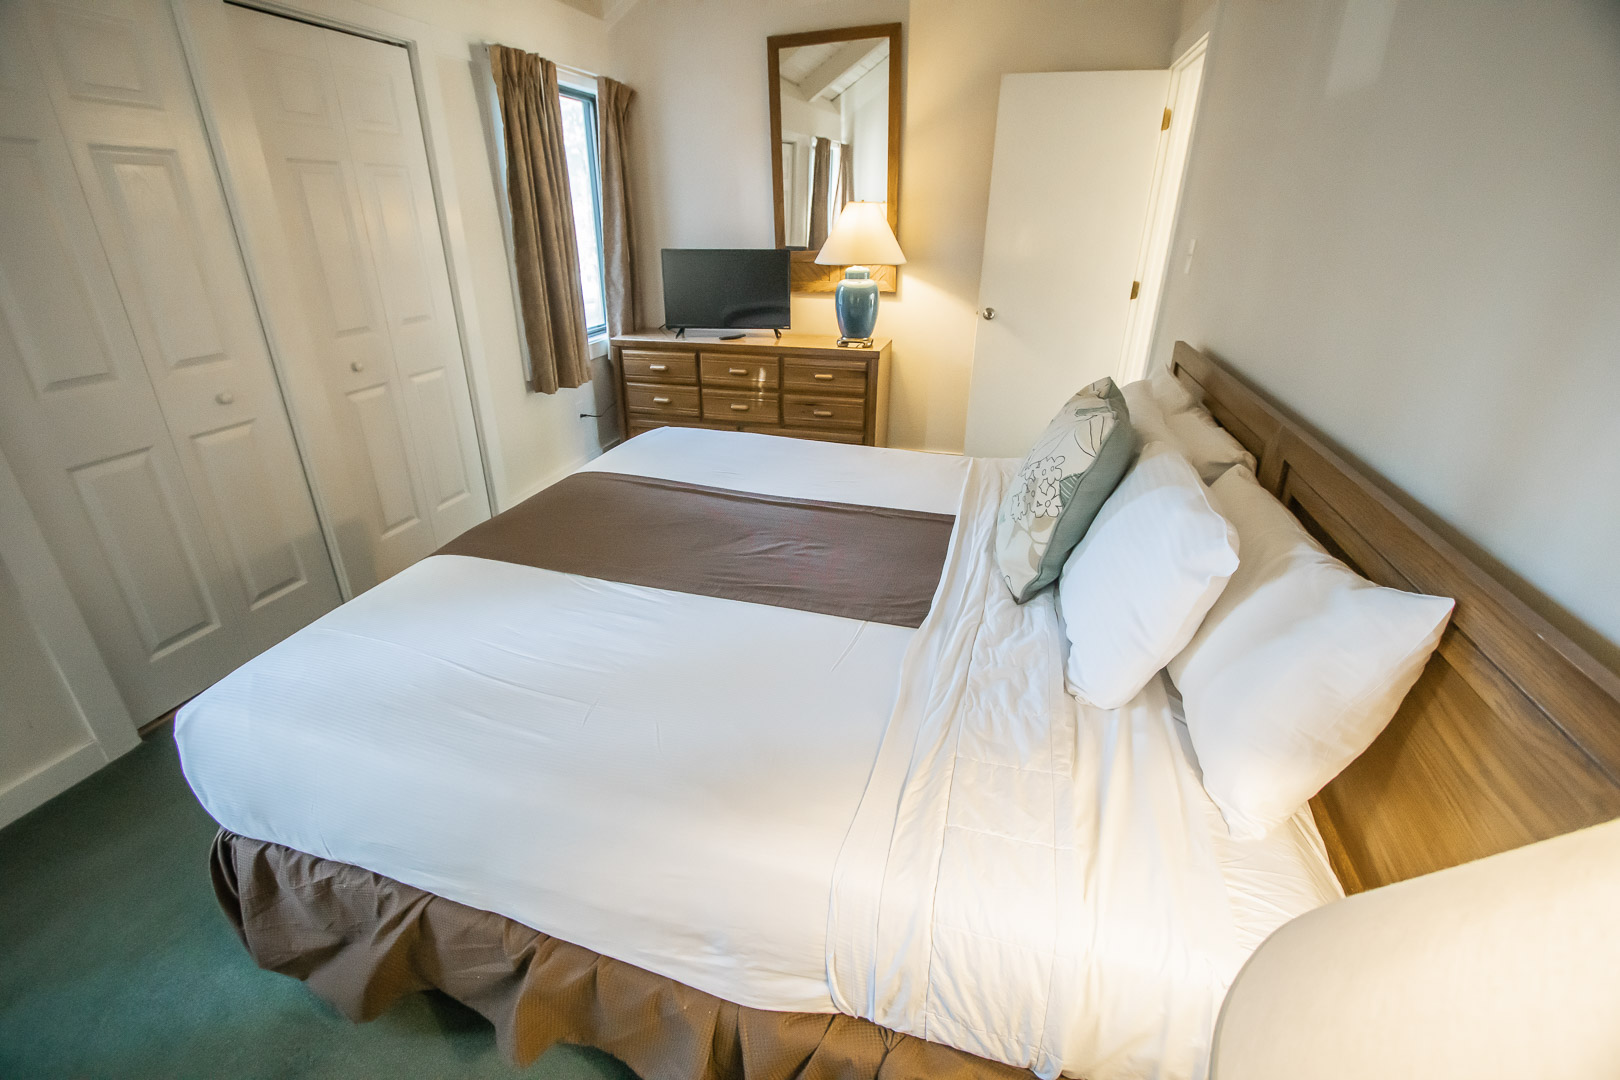 A spacious master bedroom at VRI's Waterwood Townhomes in New Bern, North Carolina.